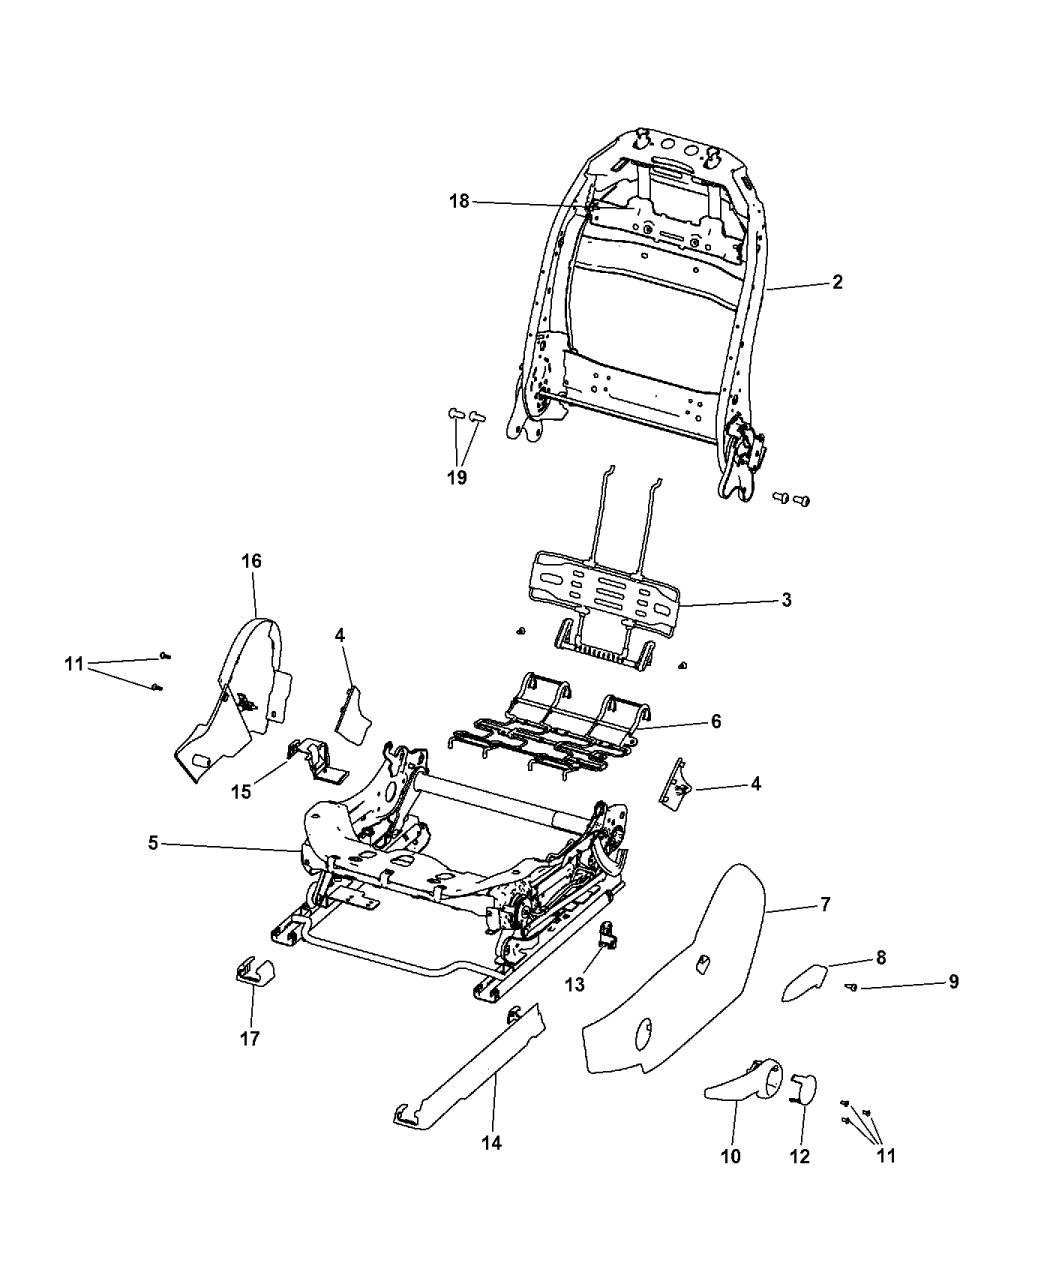 2015 Dodge Dart 2 4l Parts Diagram. Dodge. Auto Wiring Diagram